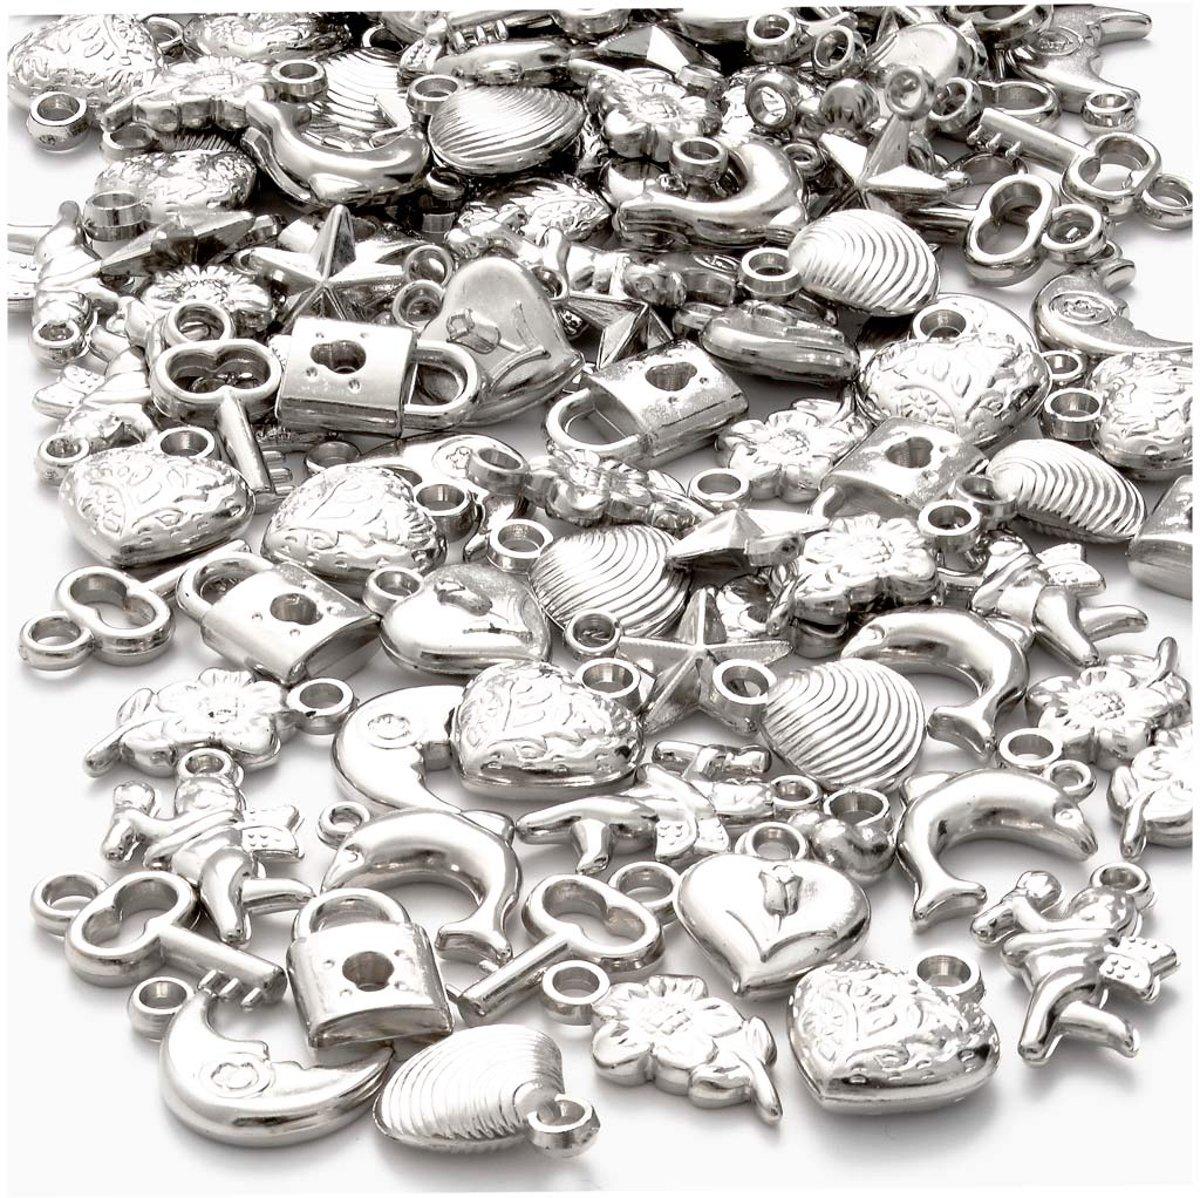 Zilveren bedels, afm 15-20 mm, 80 gr kopen